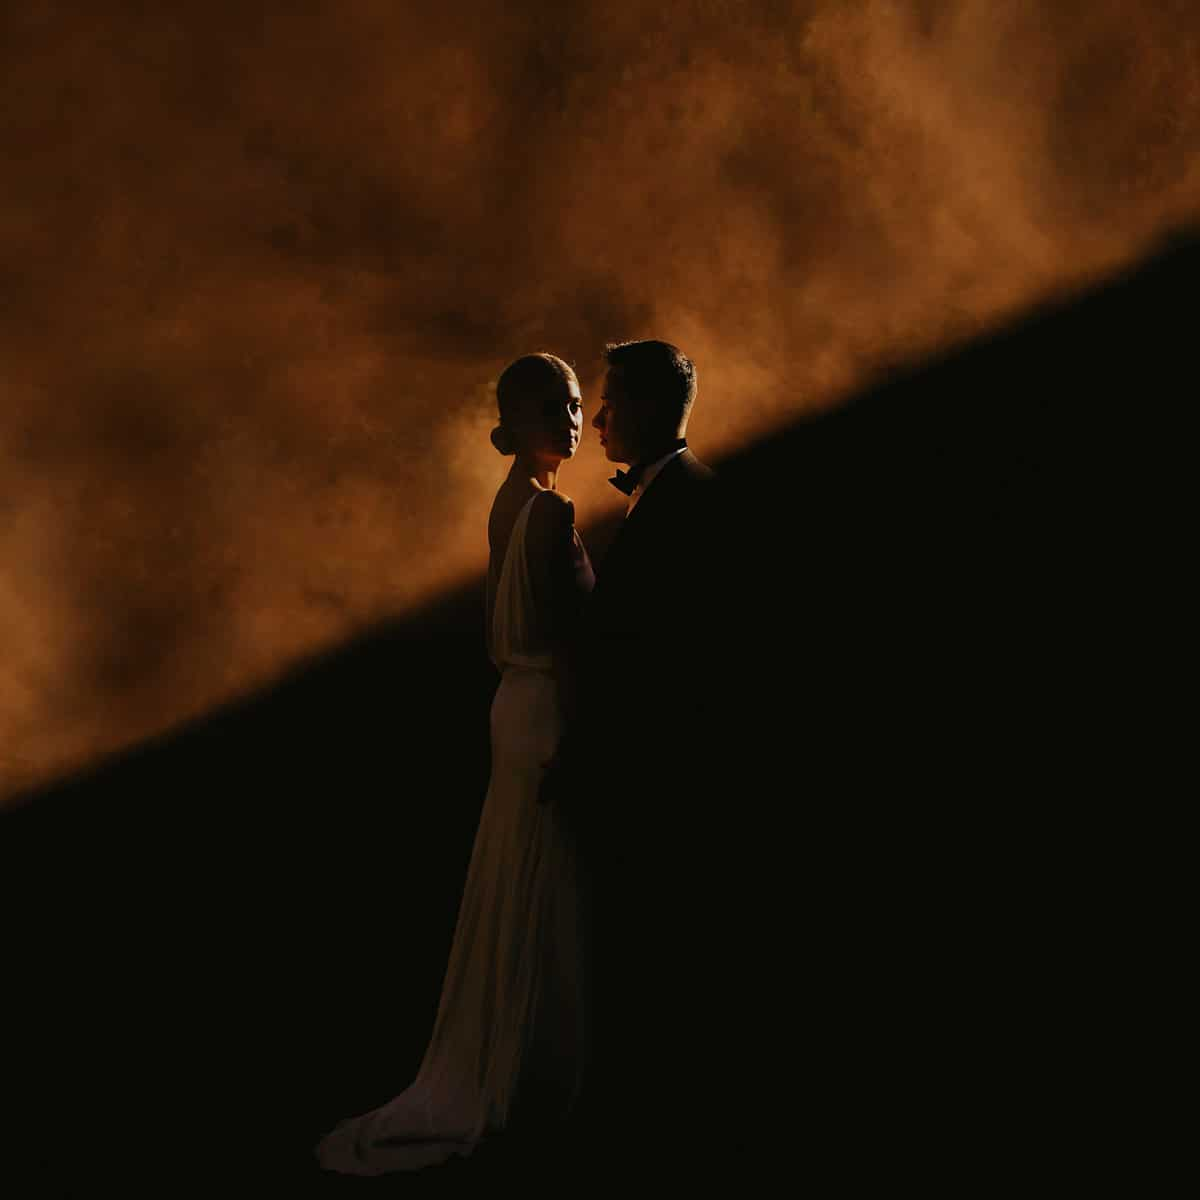 Wedding Photography Contest